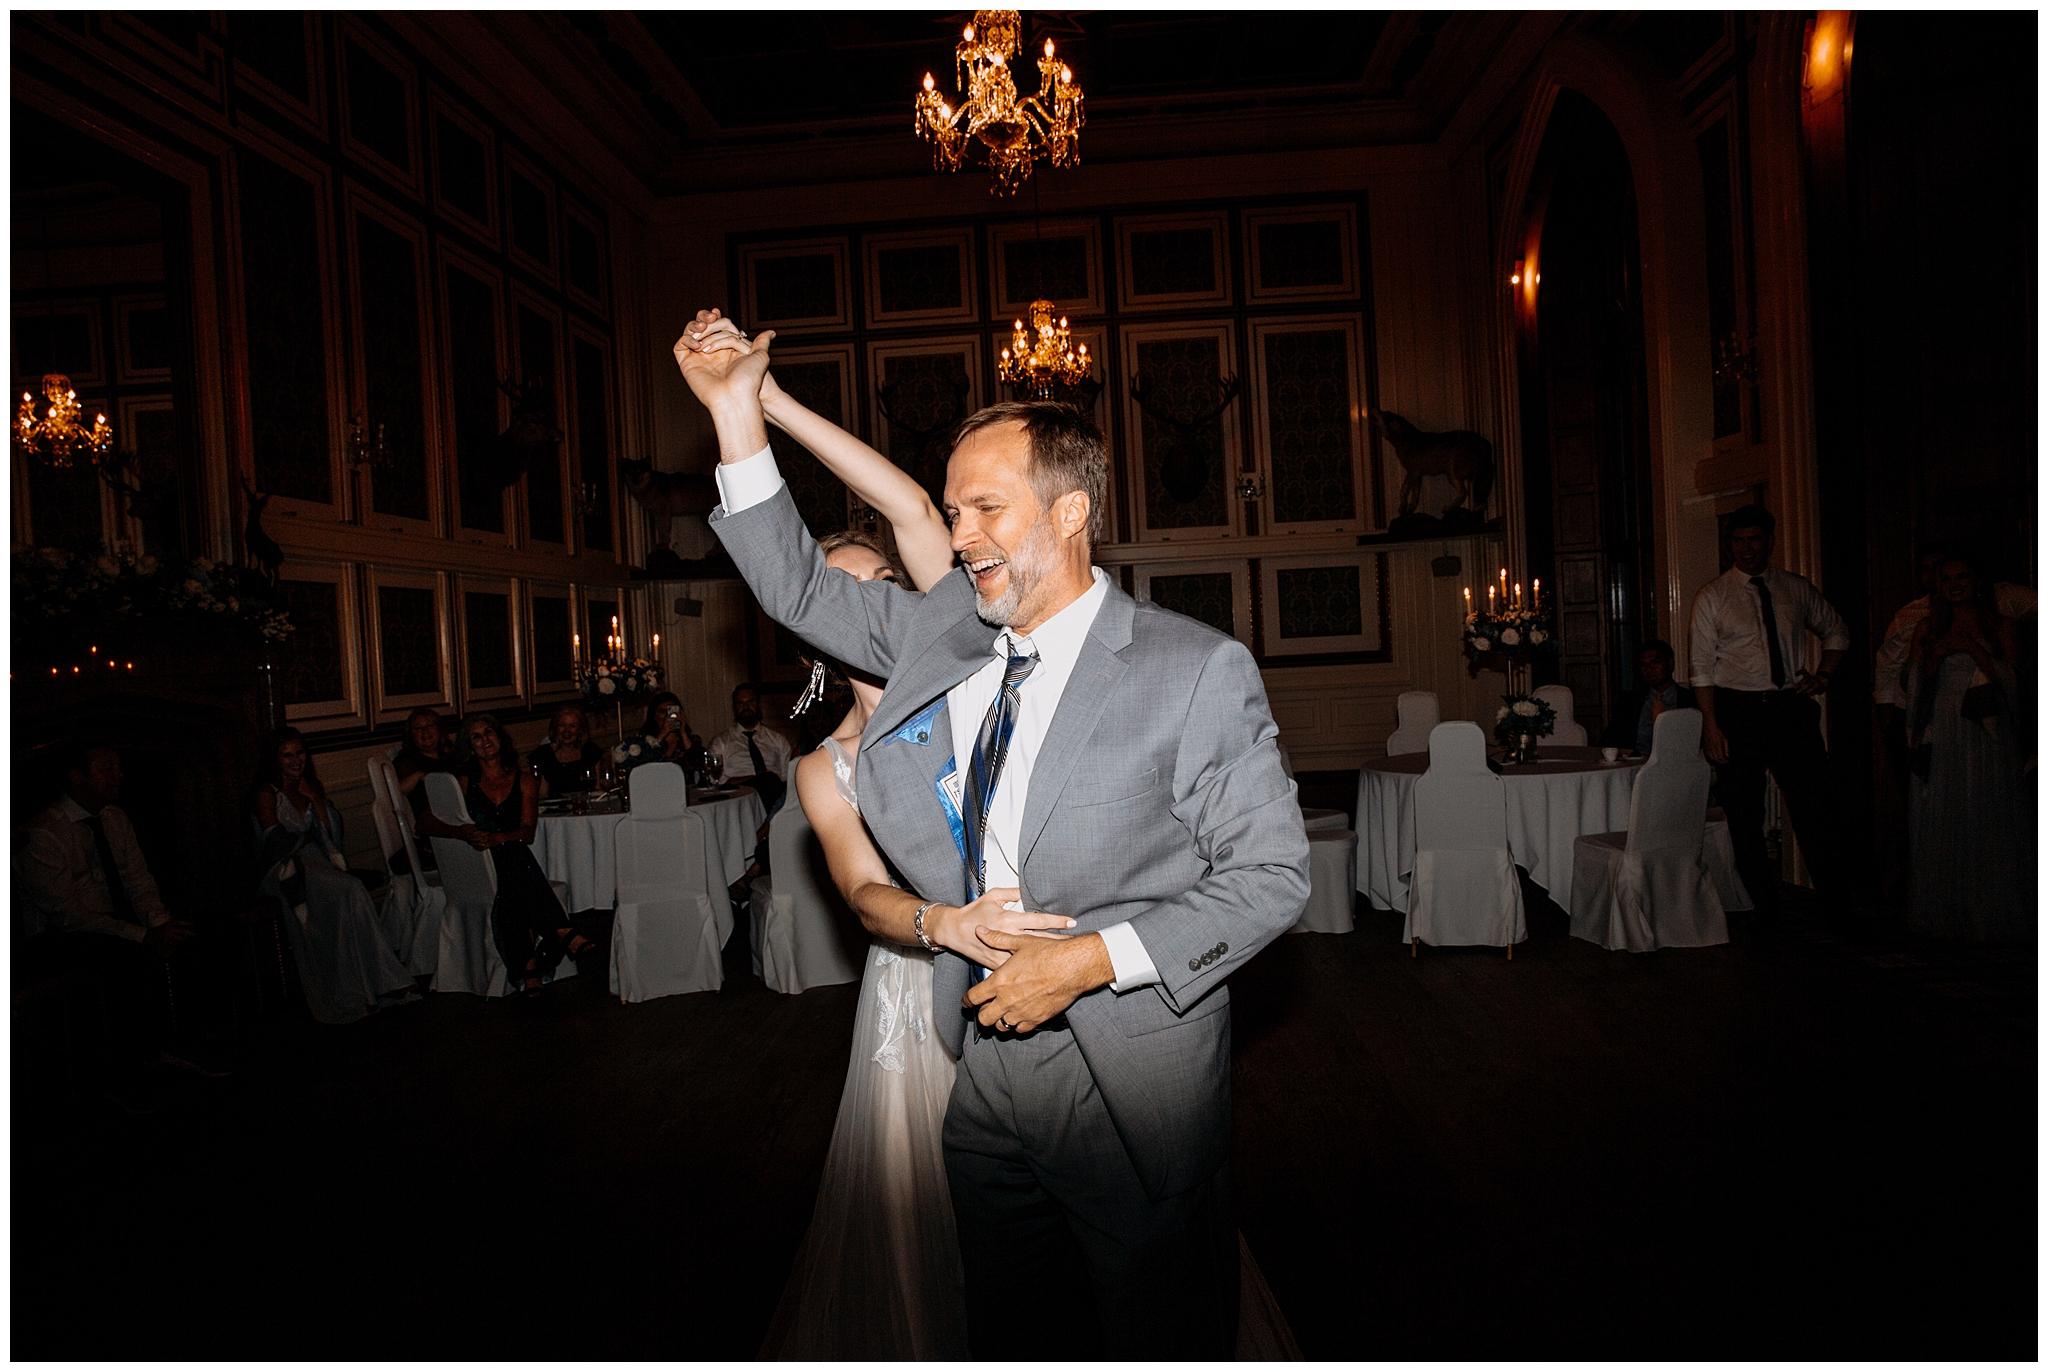 austin-texas-scottish-wedding-bride-groom22031.JPG